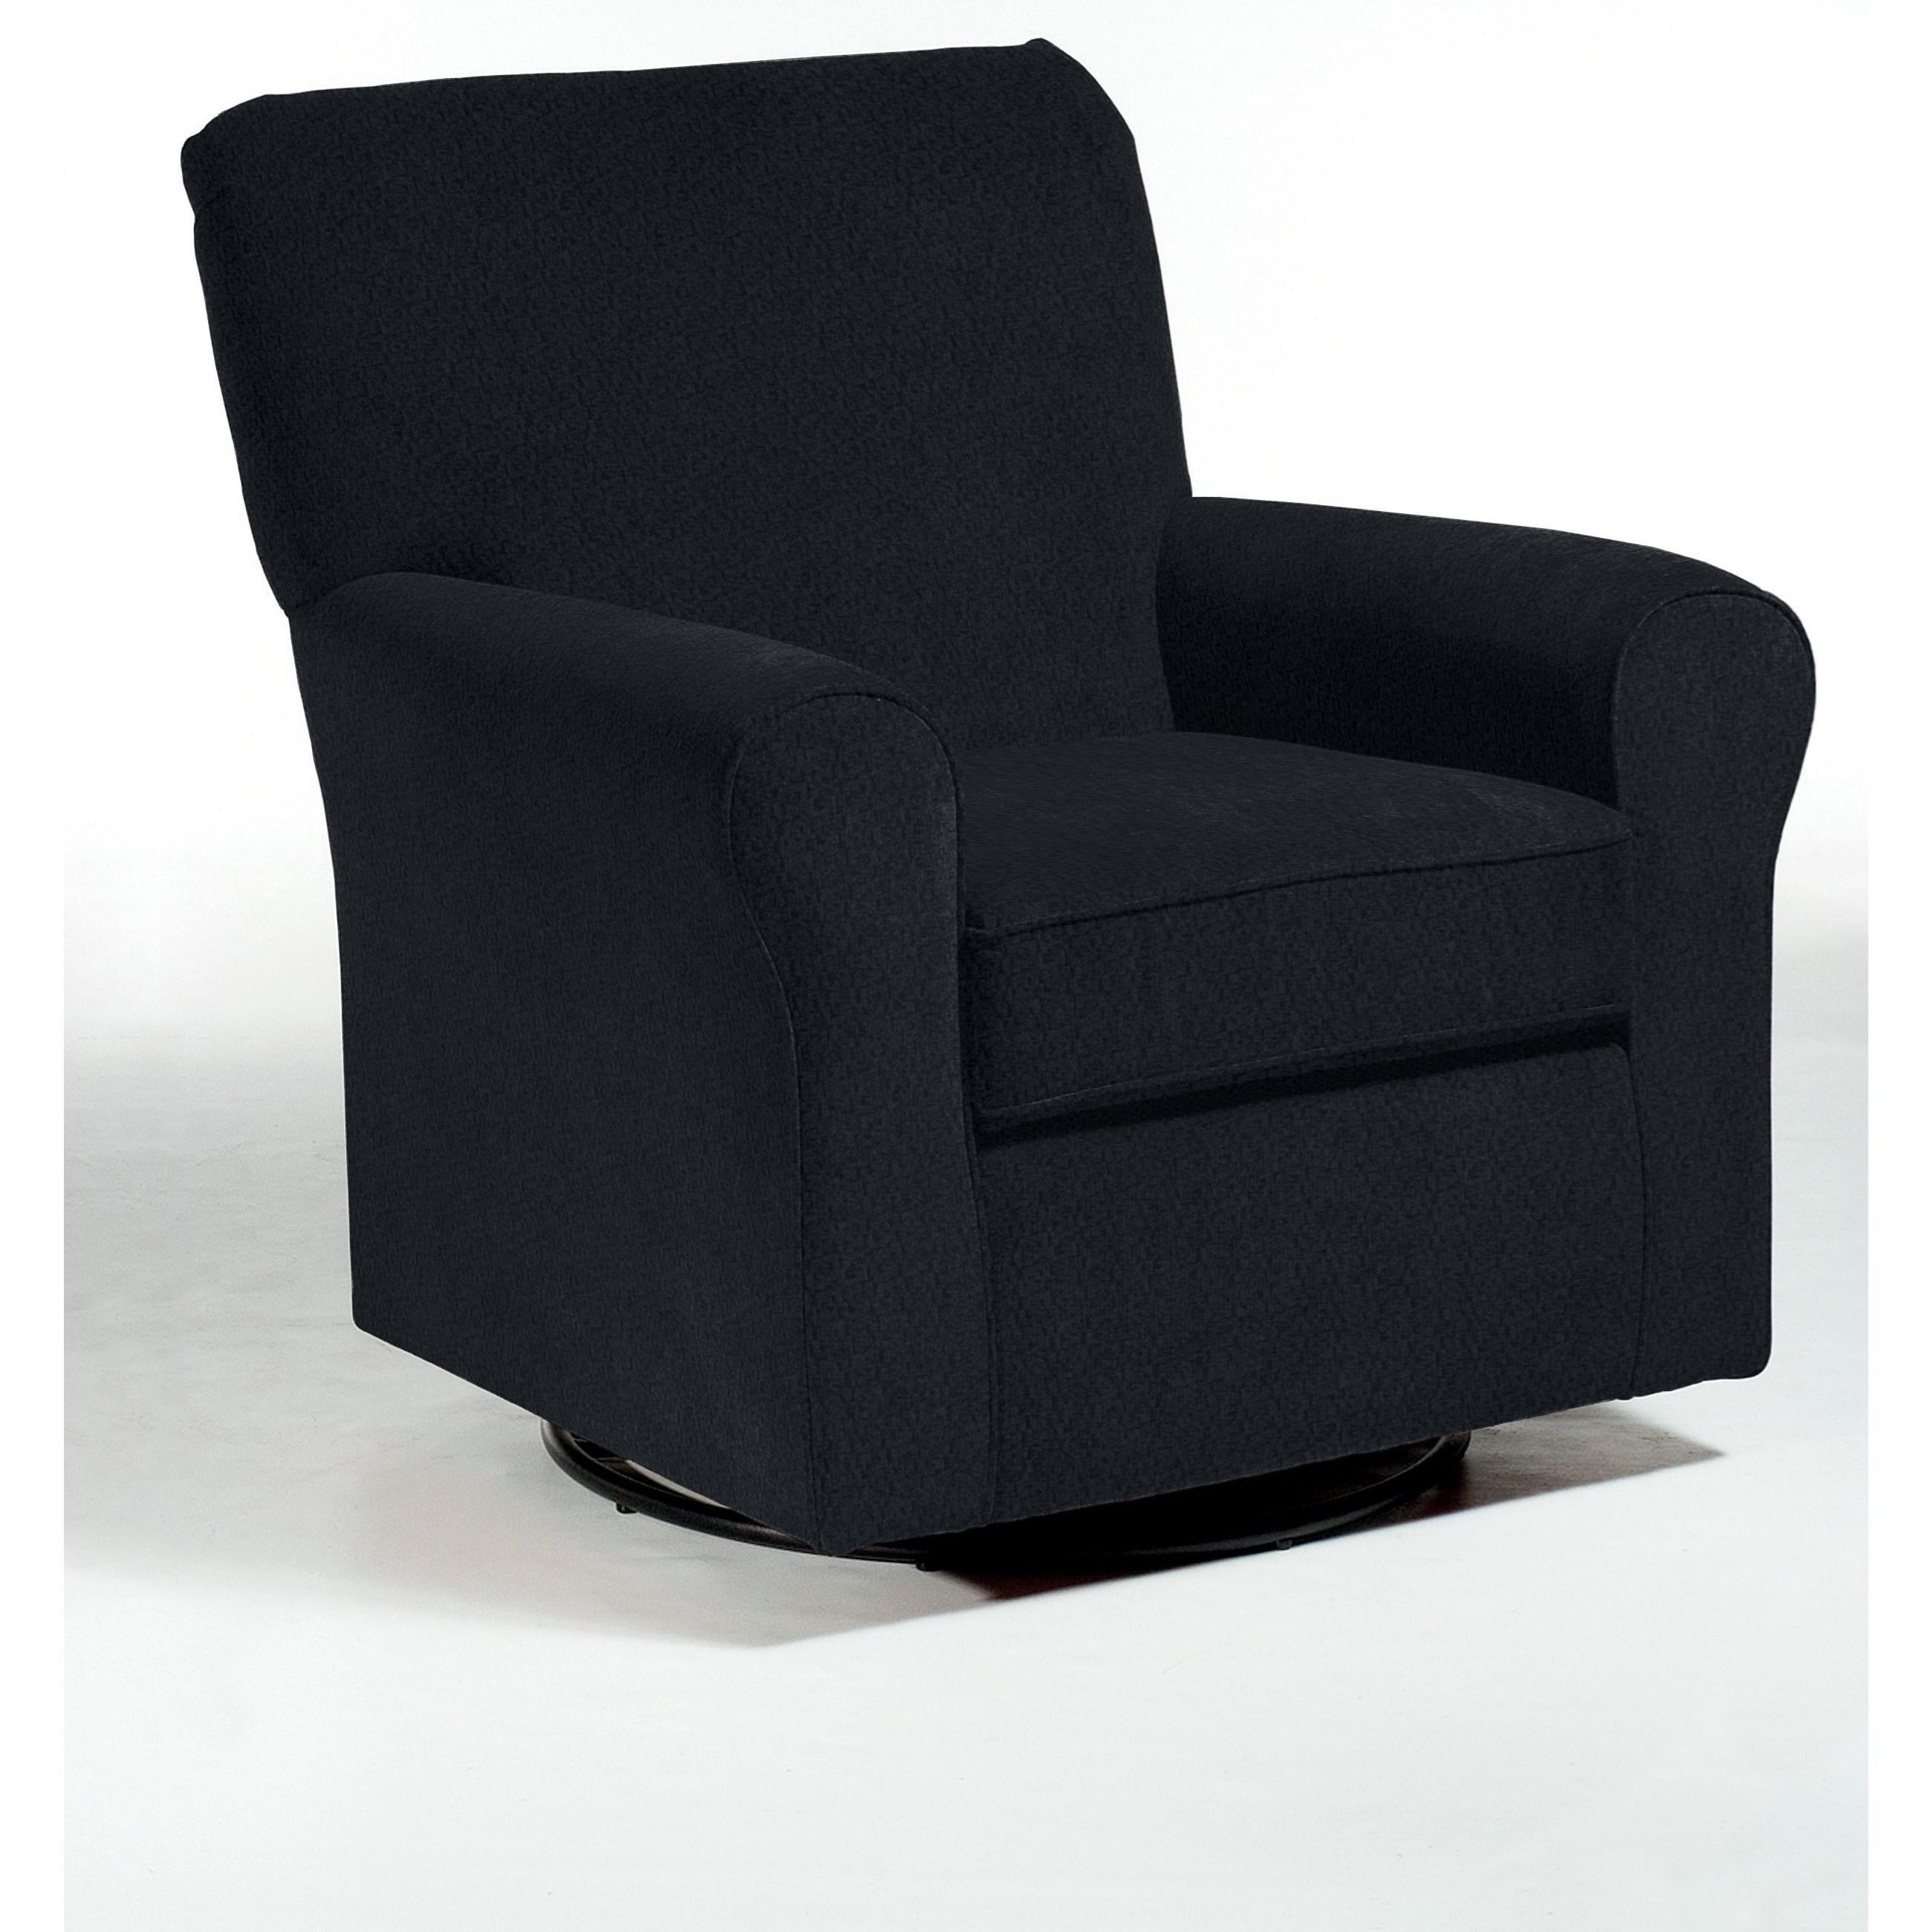 Swivel Glide Chairs Hagen Swivel Glide by Best Home Furnishings at Lucas Furniture & Mattress